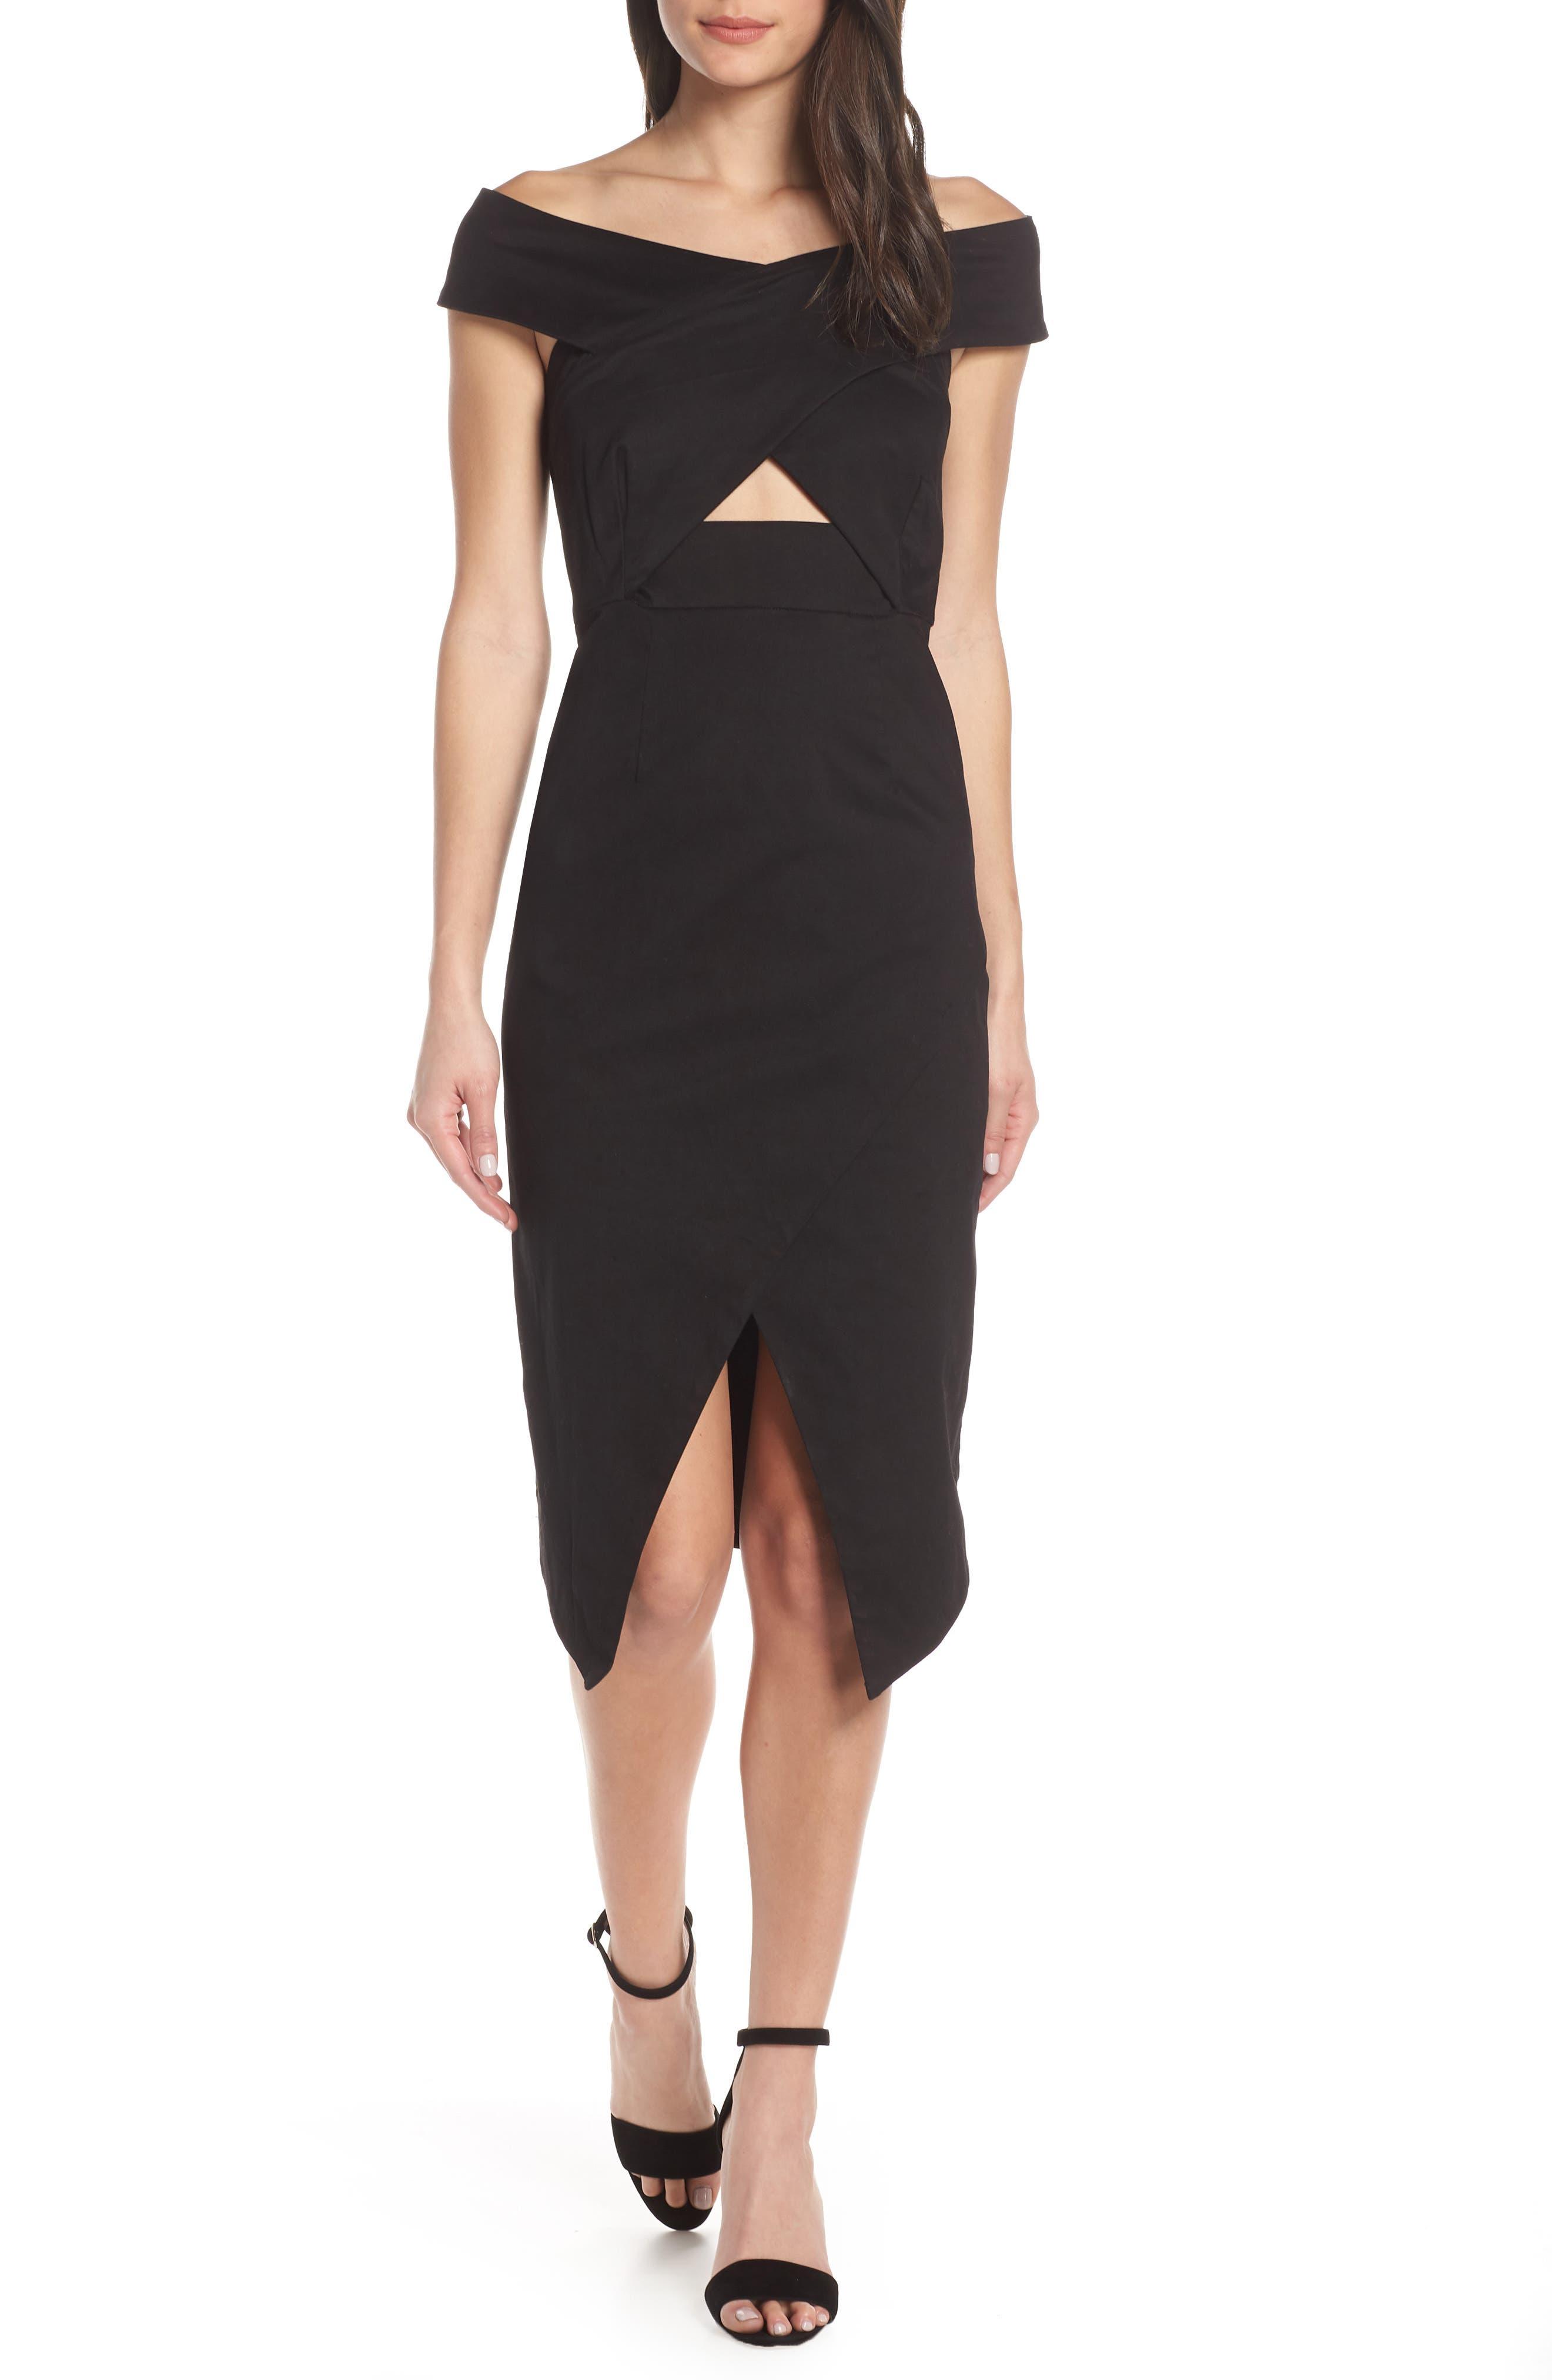 Finders Keepers Destination Sheath Dress, Black